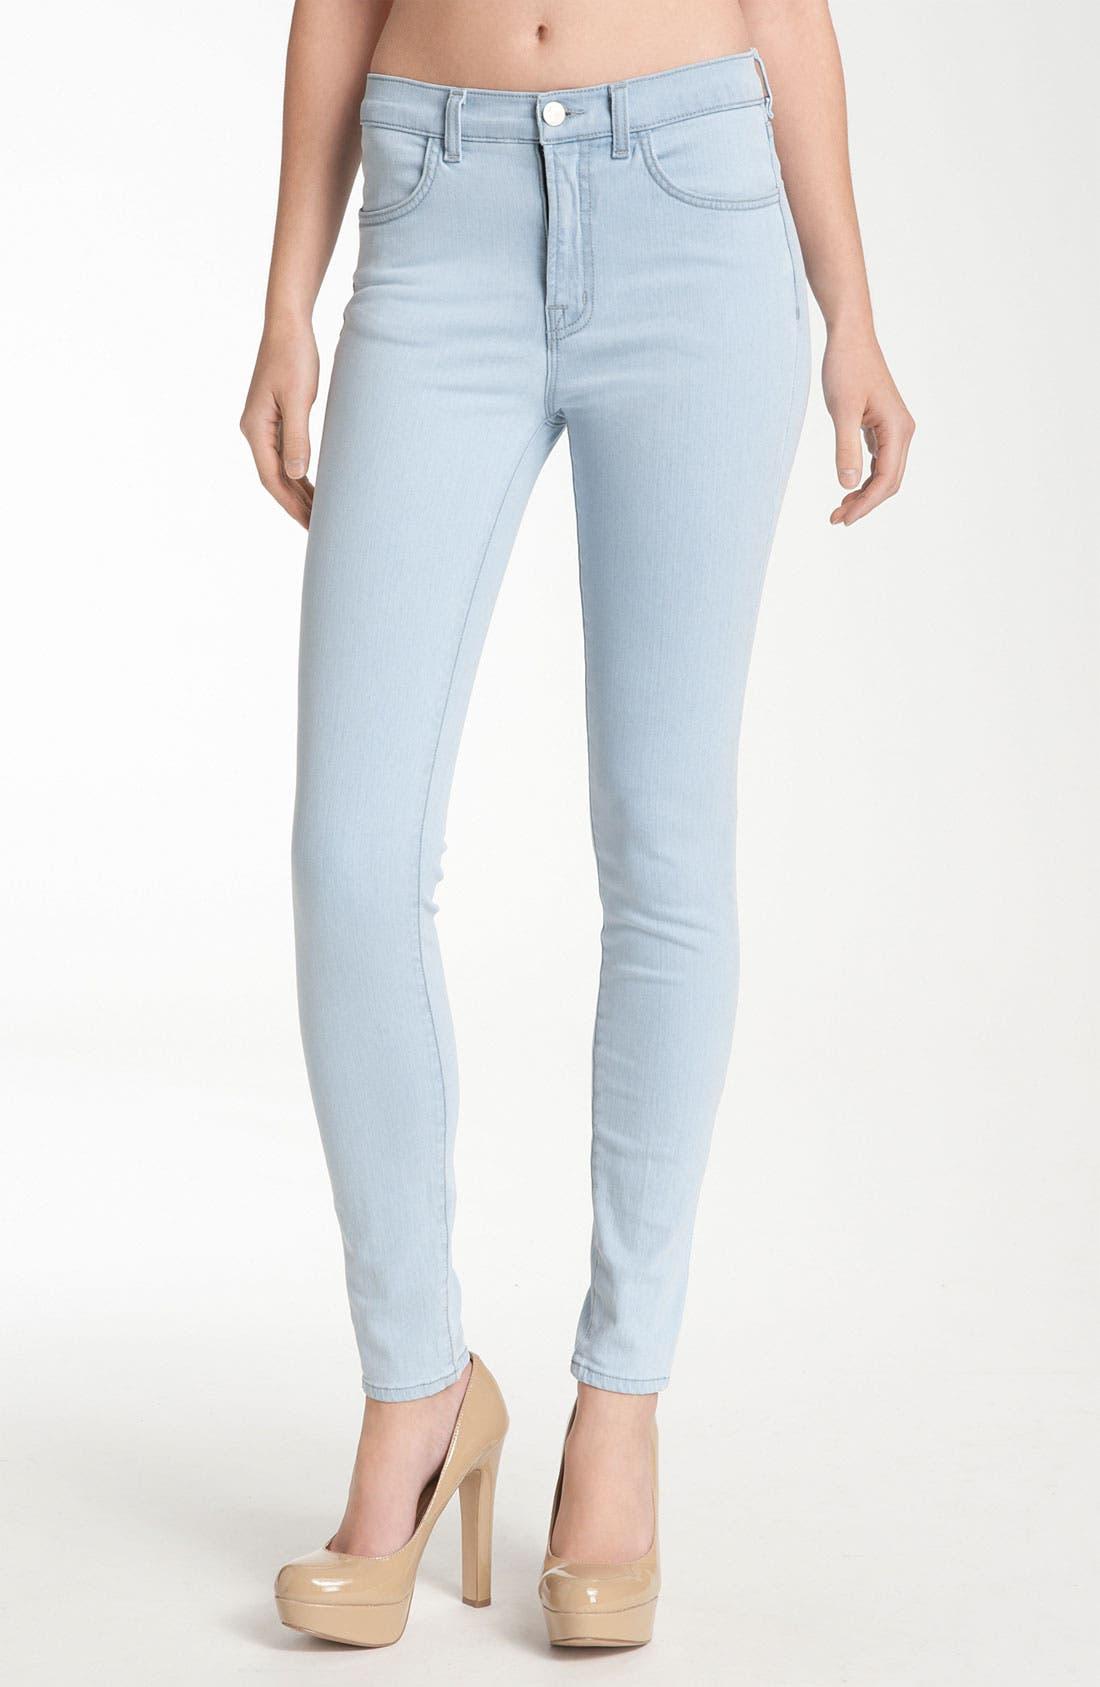 Alternate Image 1 Selected - J Brand 'Maria' High Rise Skinny Leg Stretch Jeans (Iceland)